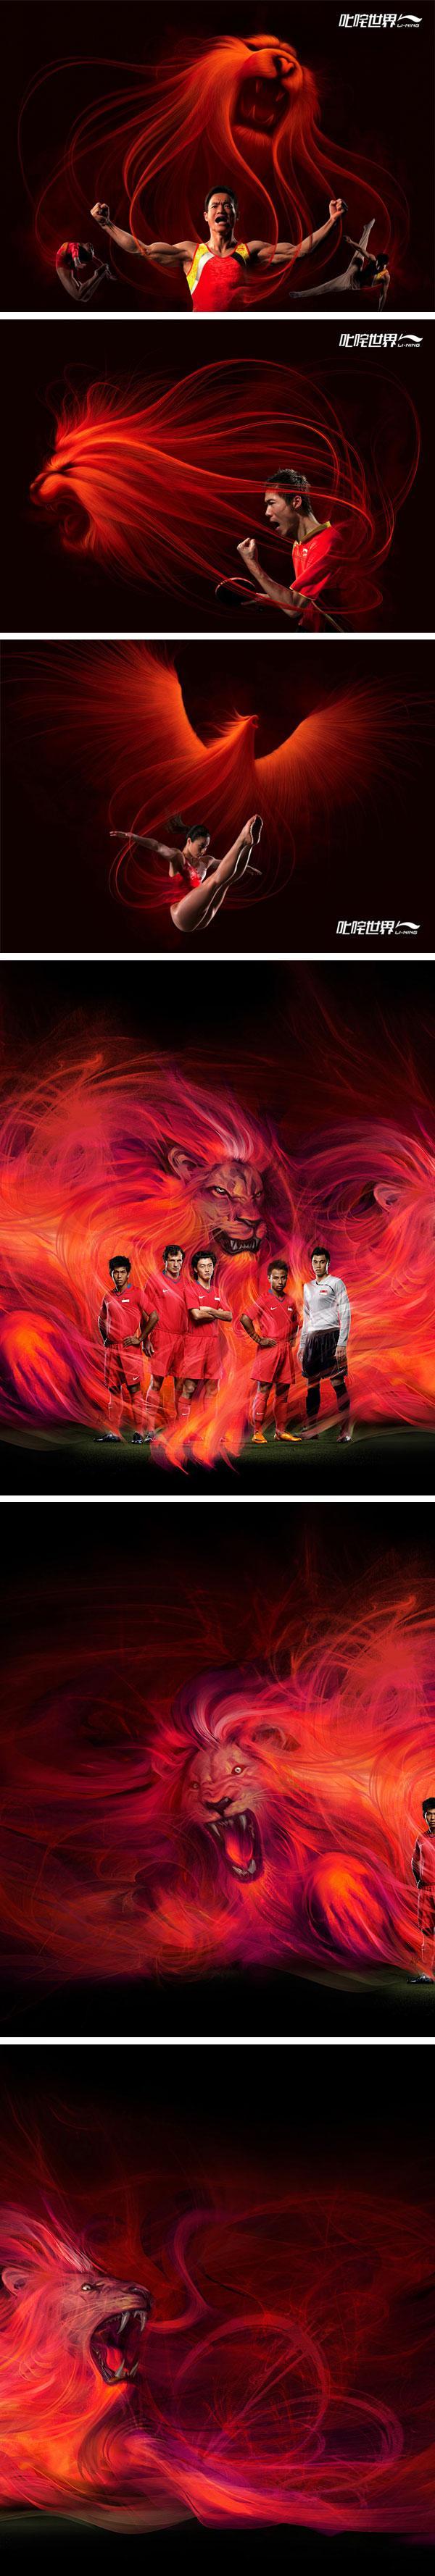 Nike by Huang chueng   MRG LAB BLOG creative experience